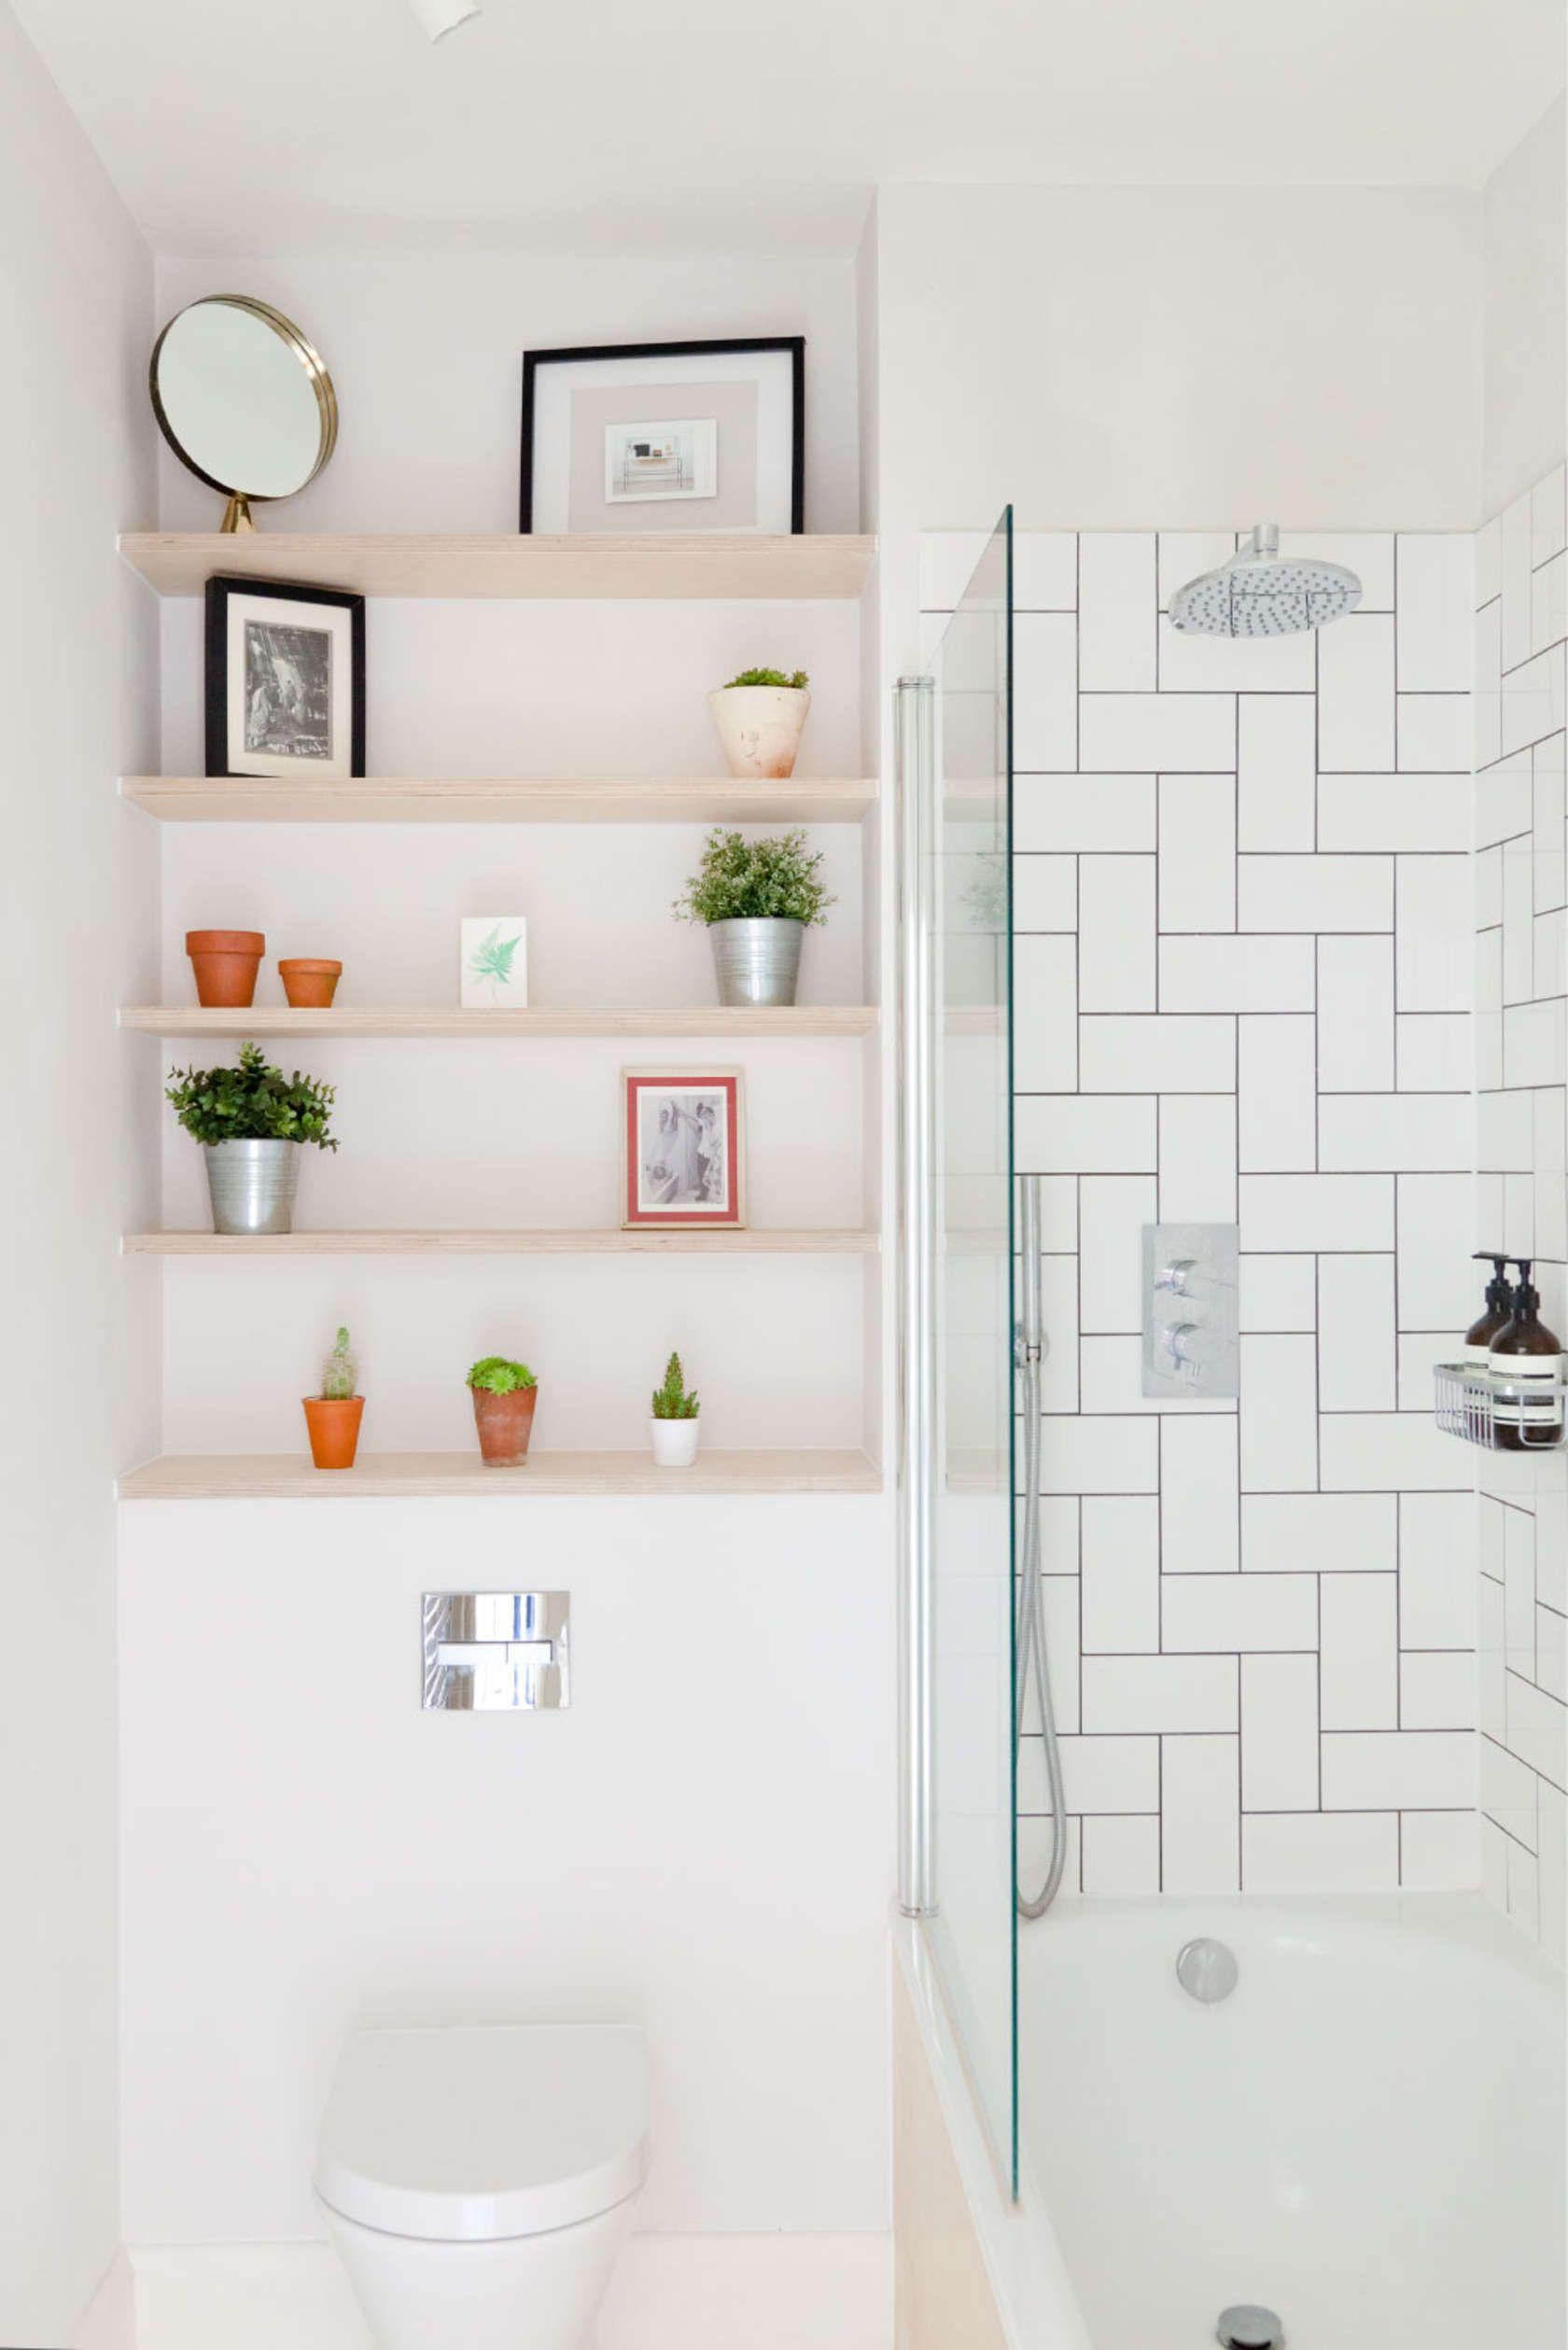 Simple Bathrooms Limited beautiful simple bathrooms limited homely idea small bathroom